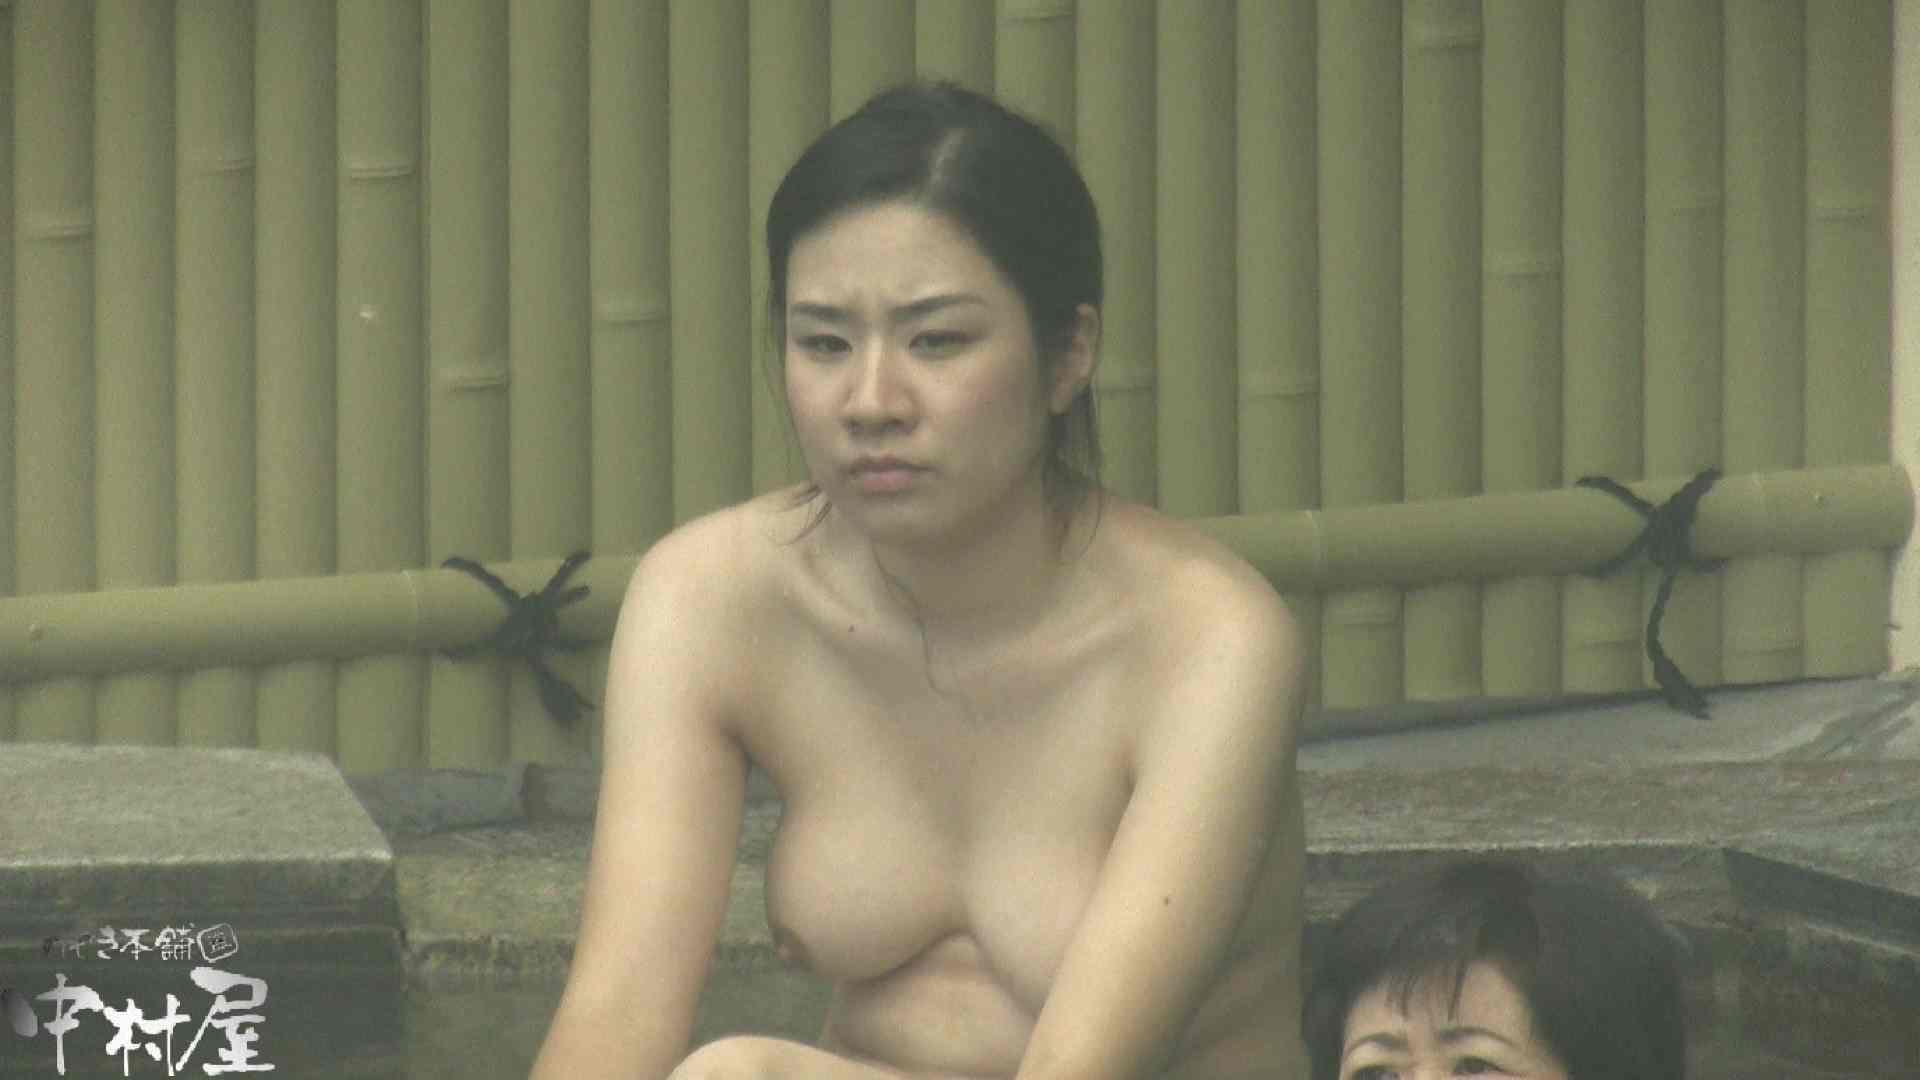 Aquaな露天風呂Vol.913 OLのエロ生活 すけべAV動画紹介 68連発 17